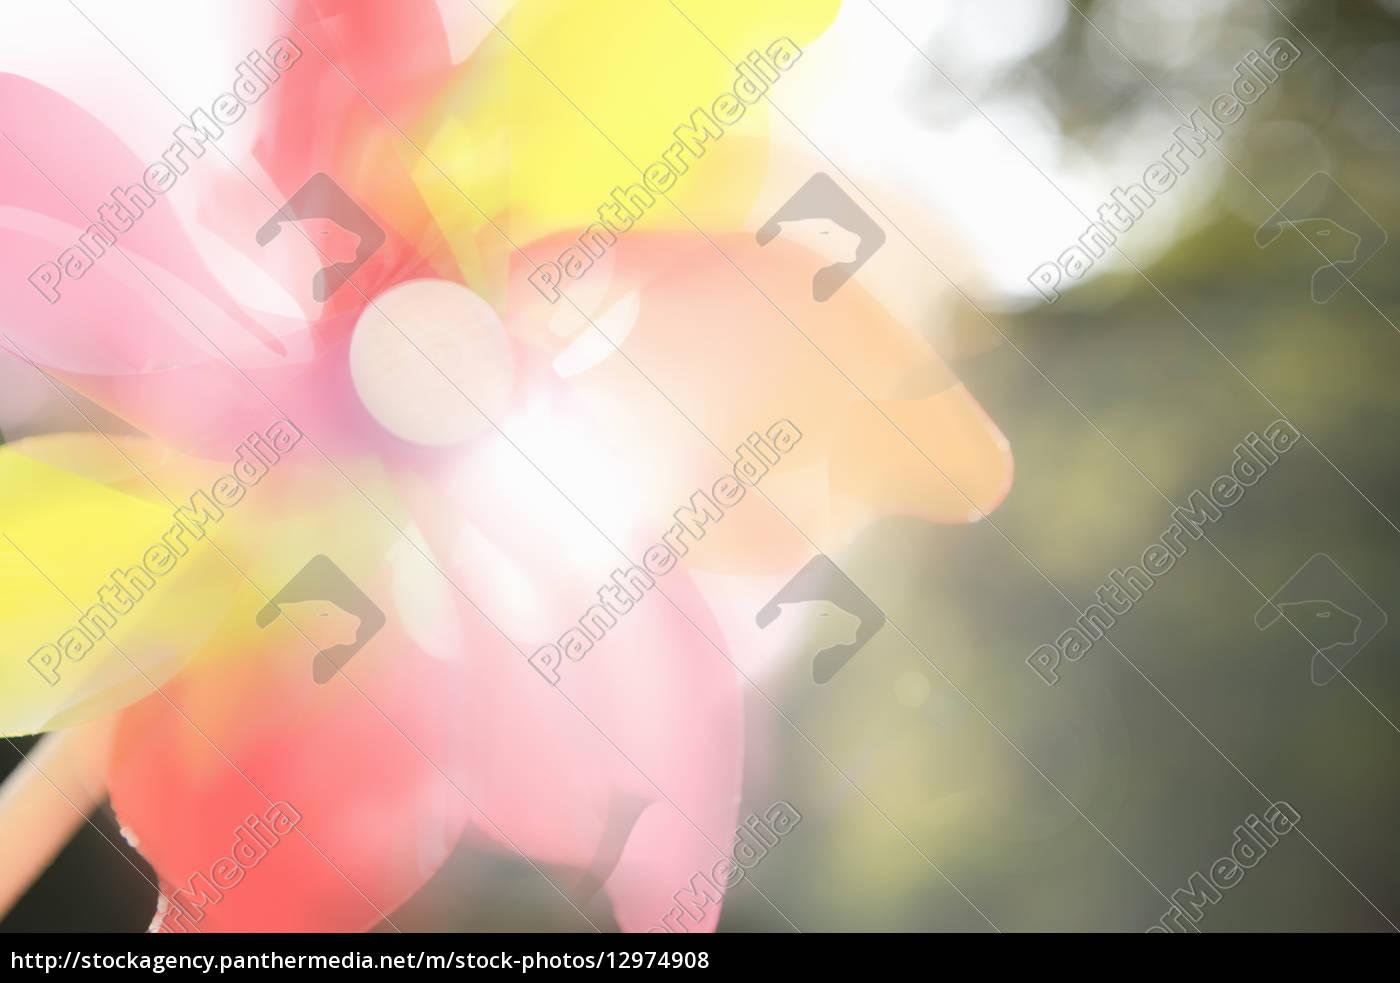 close-up, von, windrad, (lens, flare) - 12974908